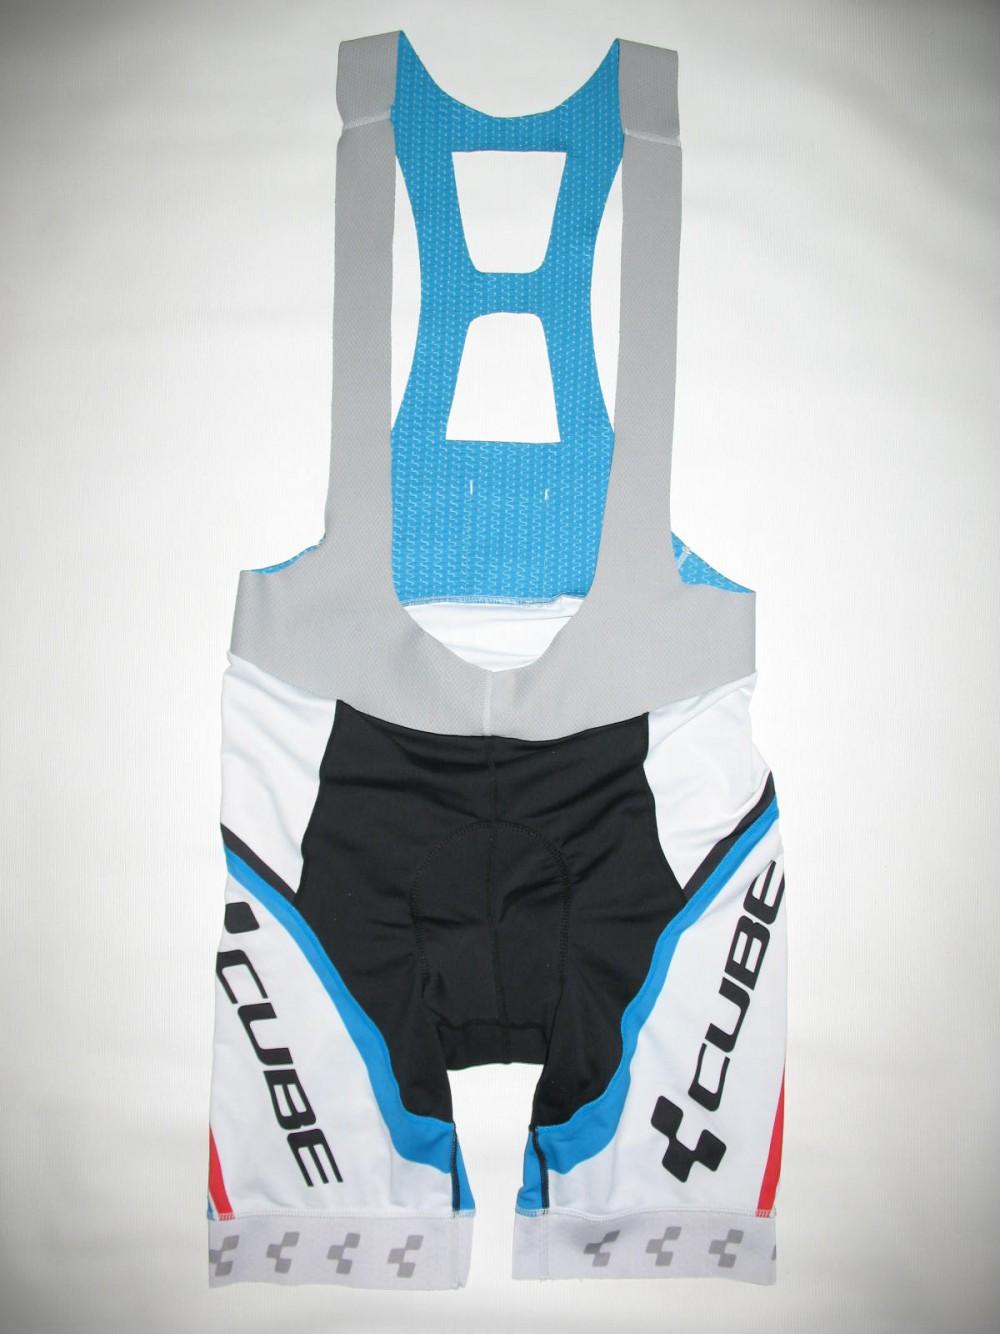 Велошорты CUBE team bib shorts (размер XXL) - 1